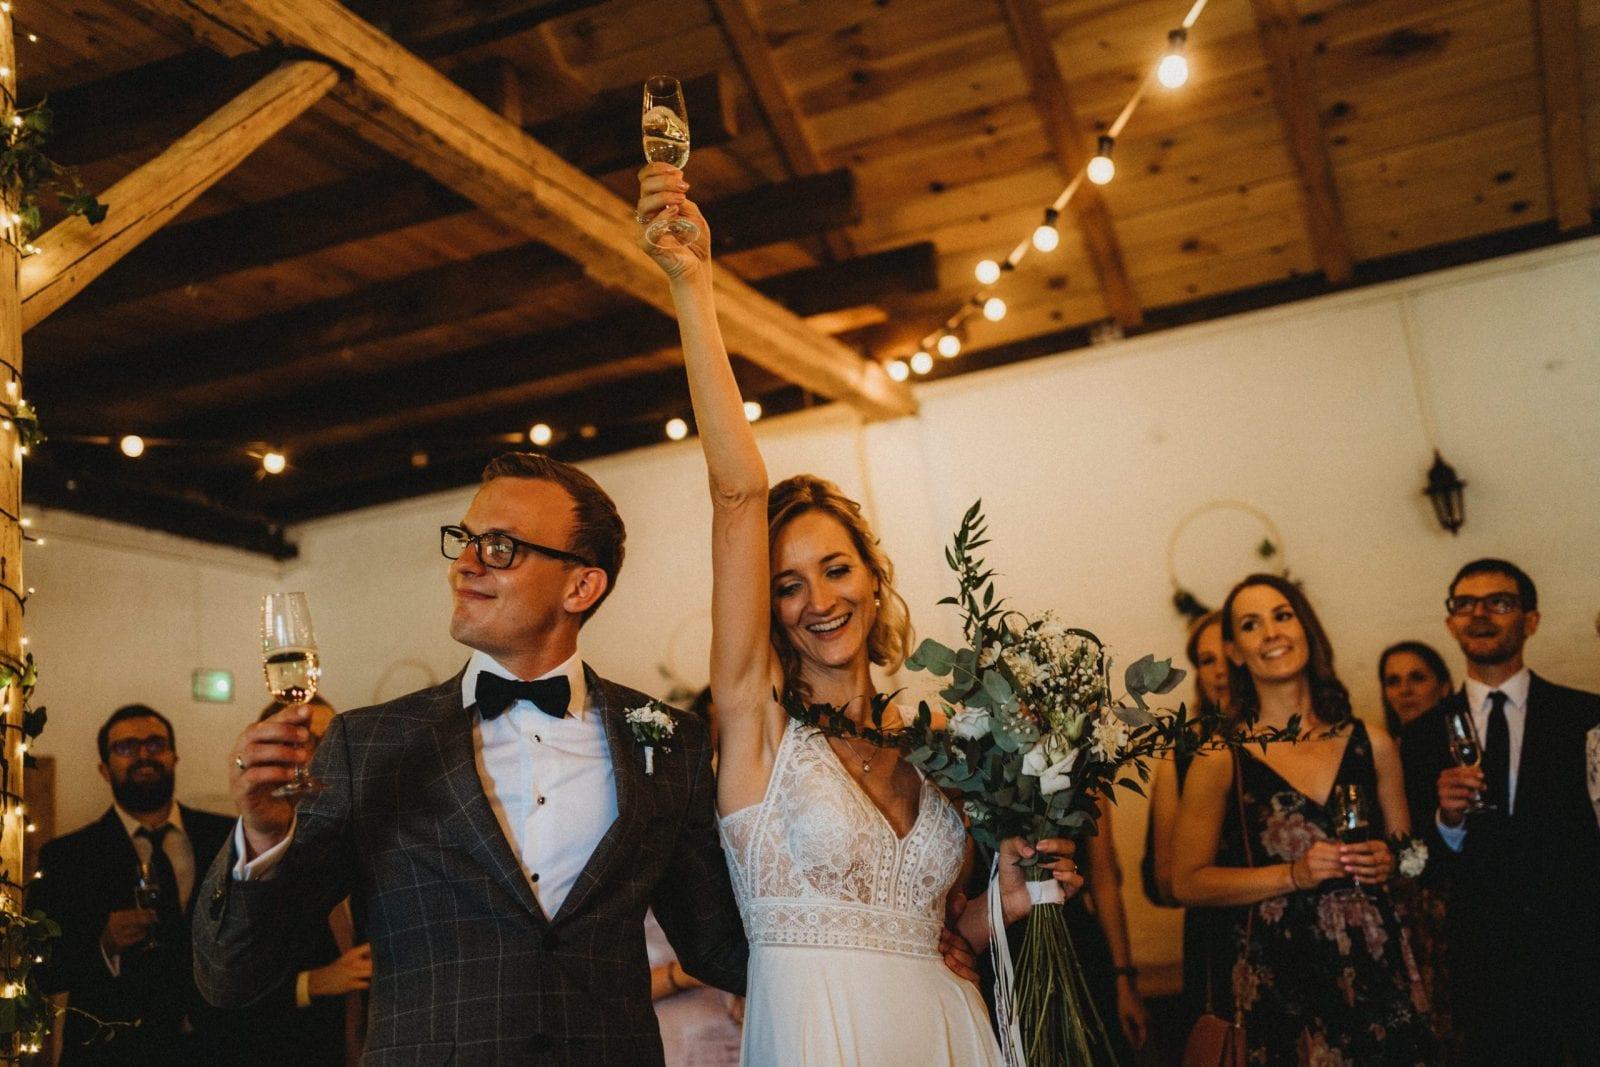 stodoła na wesele zachodniopomorskie